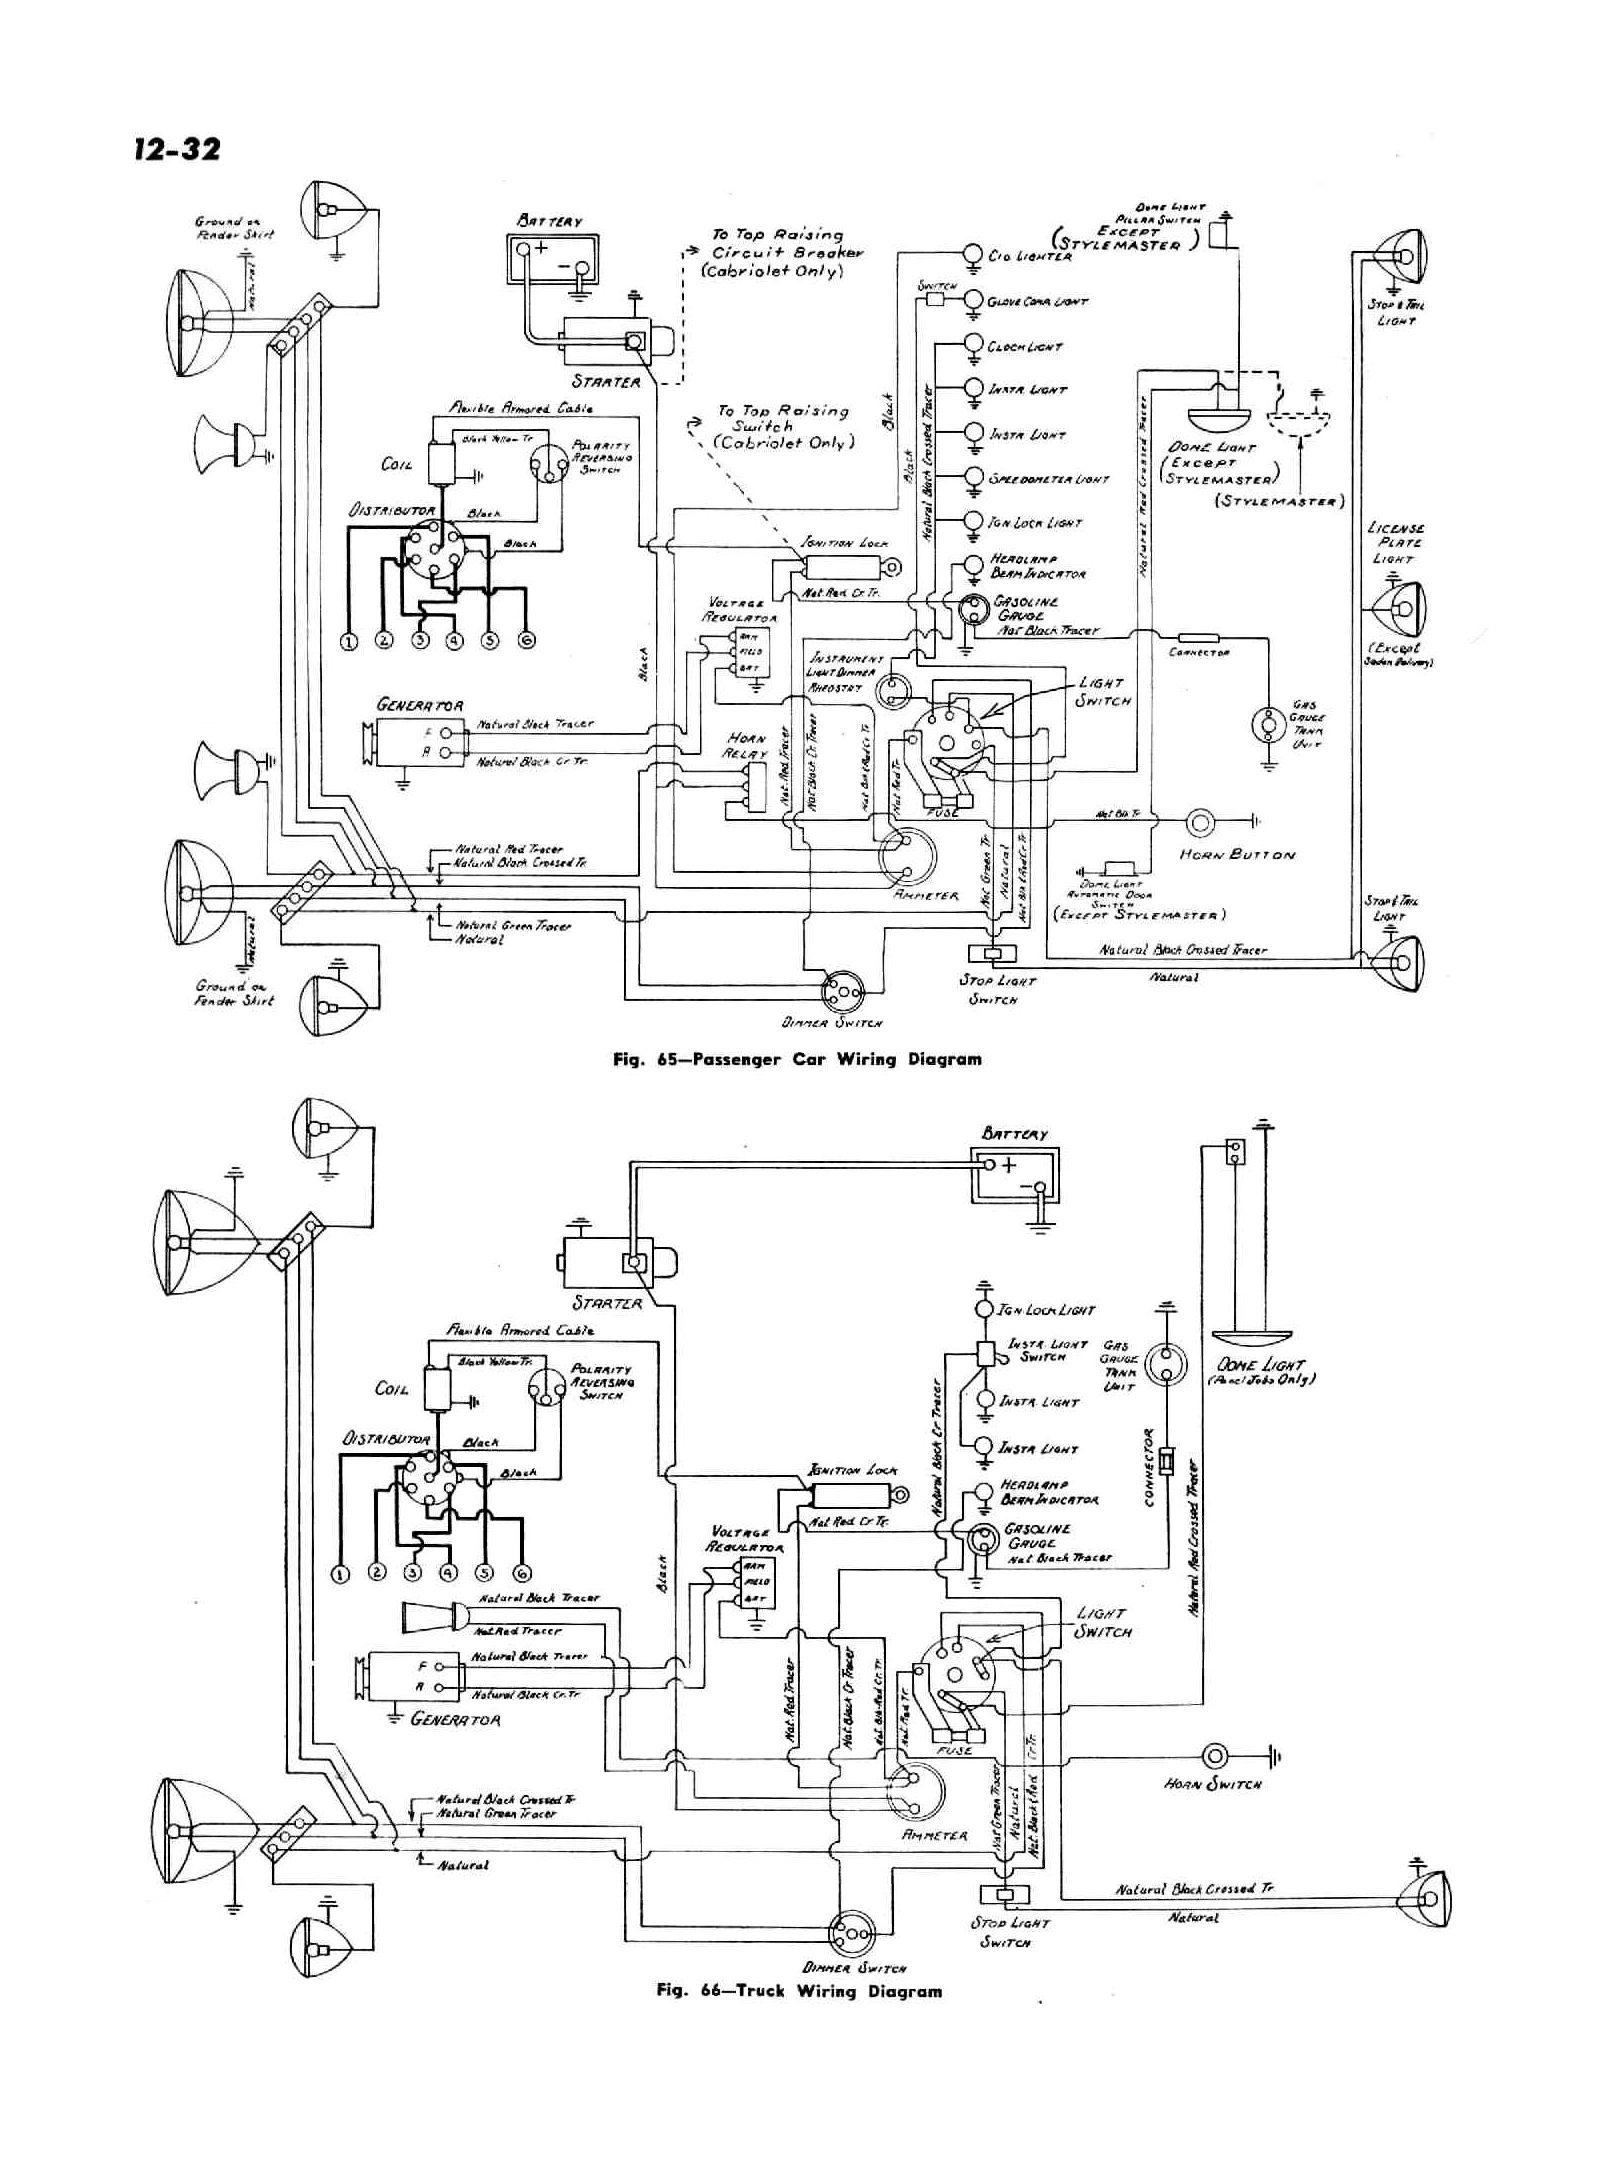 1947 Ford Wiring Diagram - Unlimited Wiring Diagram  N Volt Wiring Diagram on 8n ford points distributor wiring, 8n 6 volt regulator, 8n 12 volt conversion diagram, 8n 12 volt conversion wiring,